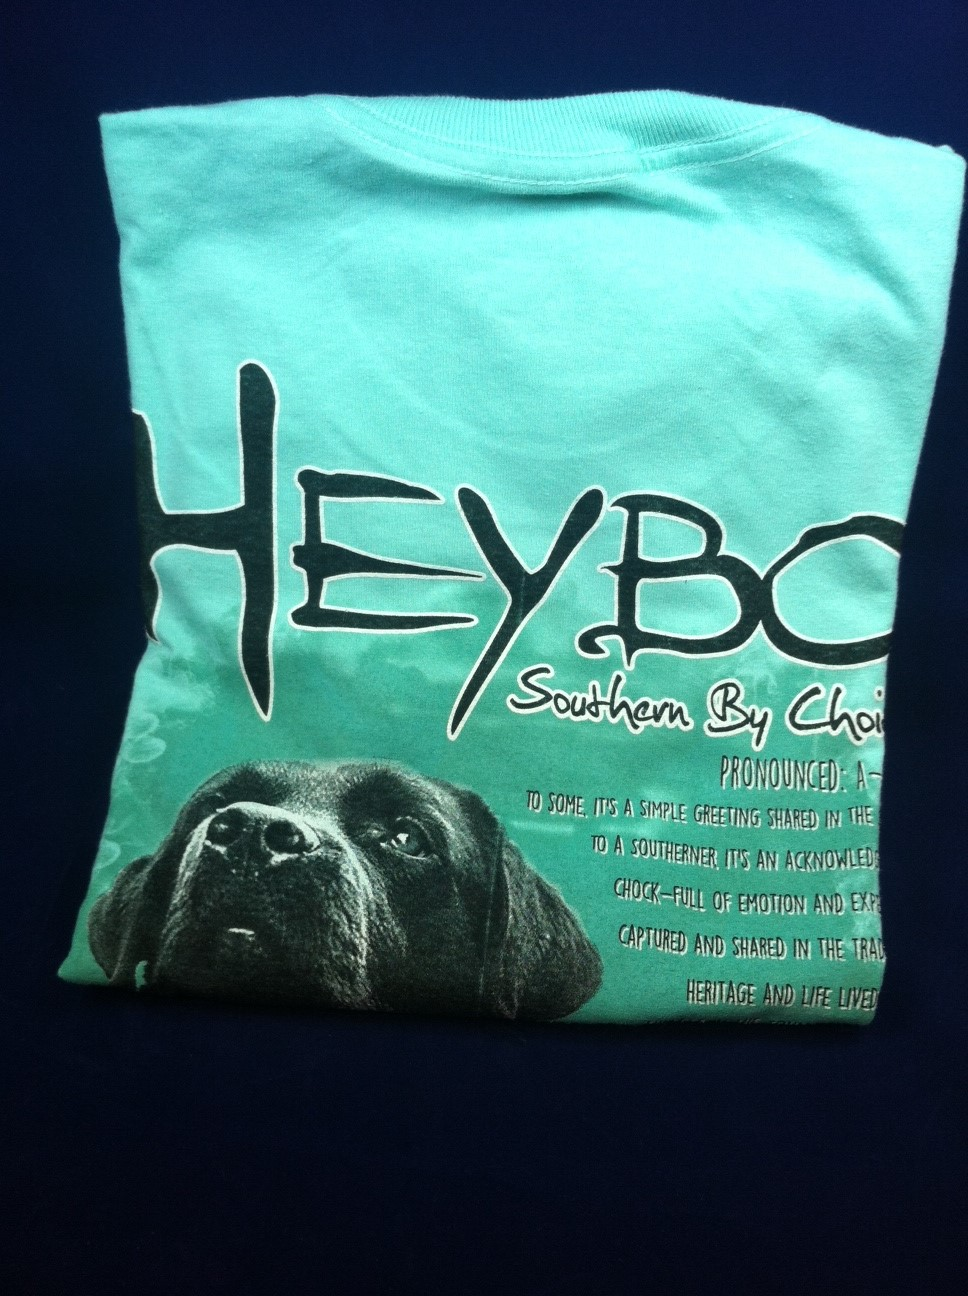 abd0c192 Heybo Maggie Definition Short Sleeve T-shirt | Safford Trading Company